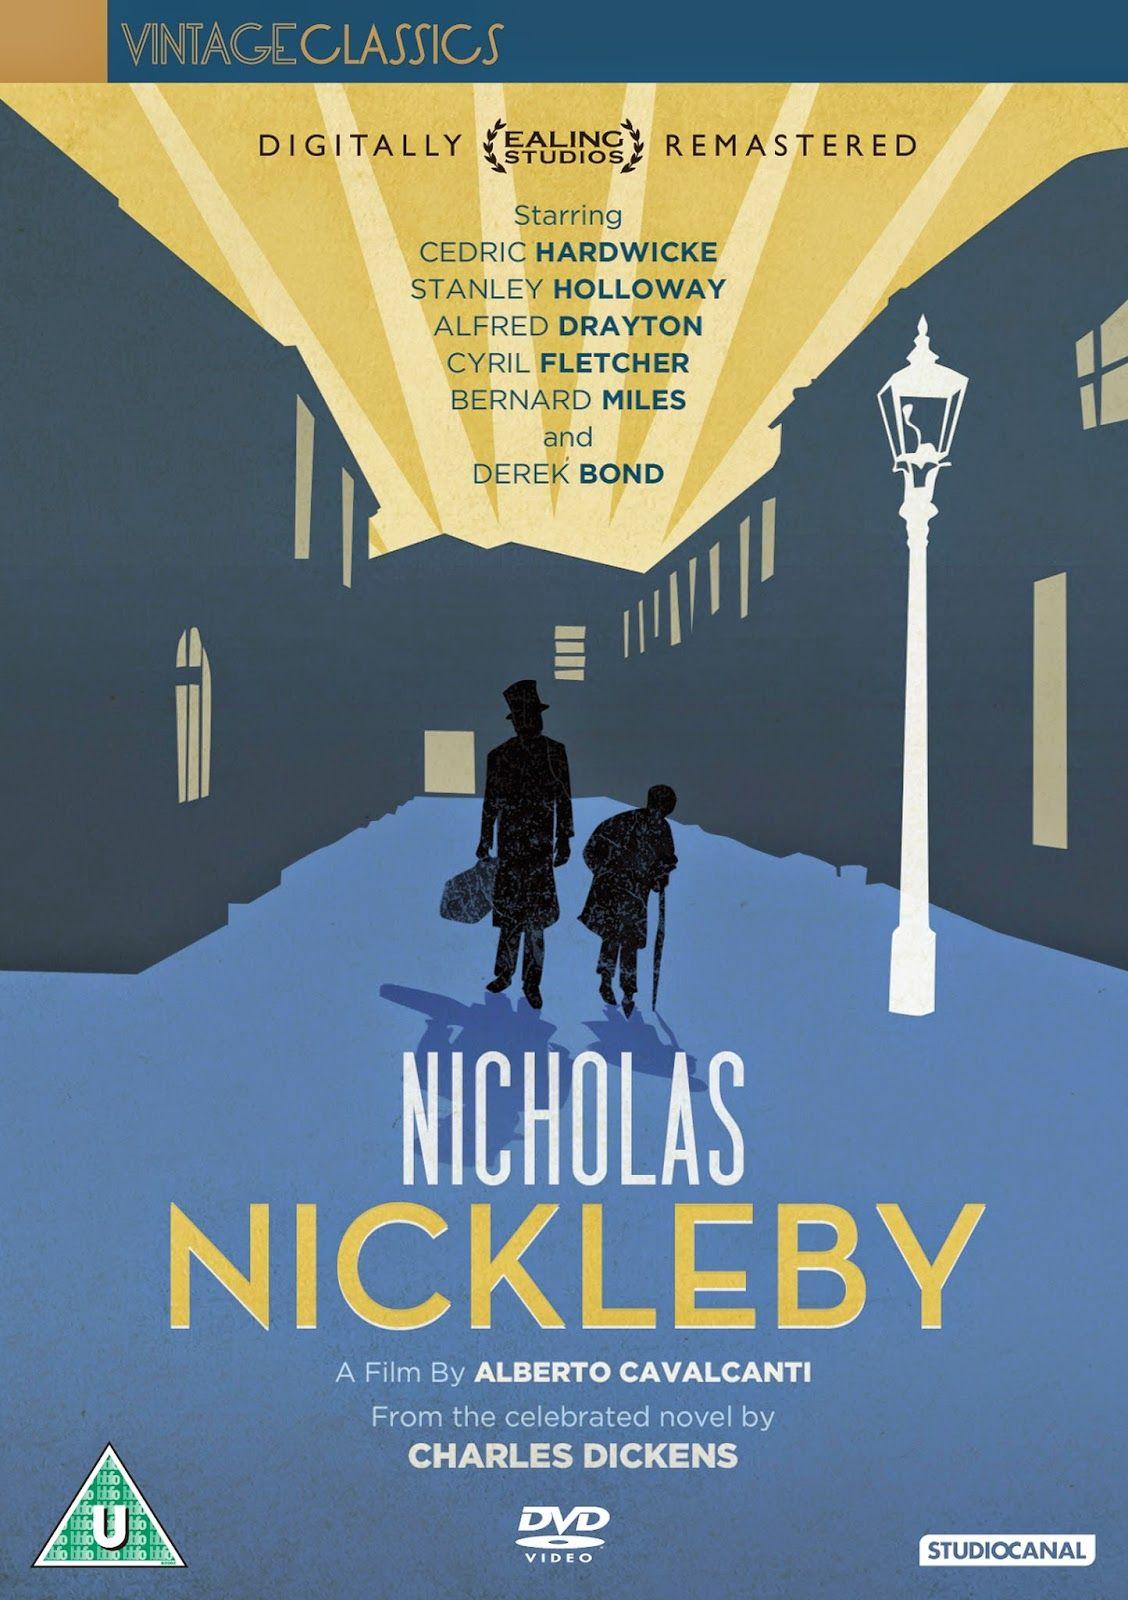 http://mazaj3.blogspot.com/2015/04/the-life-and-adventures-of-nicholas.html #book #books #ebook #ebooks #novel #novels #pdf #PDF #Pdf